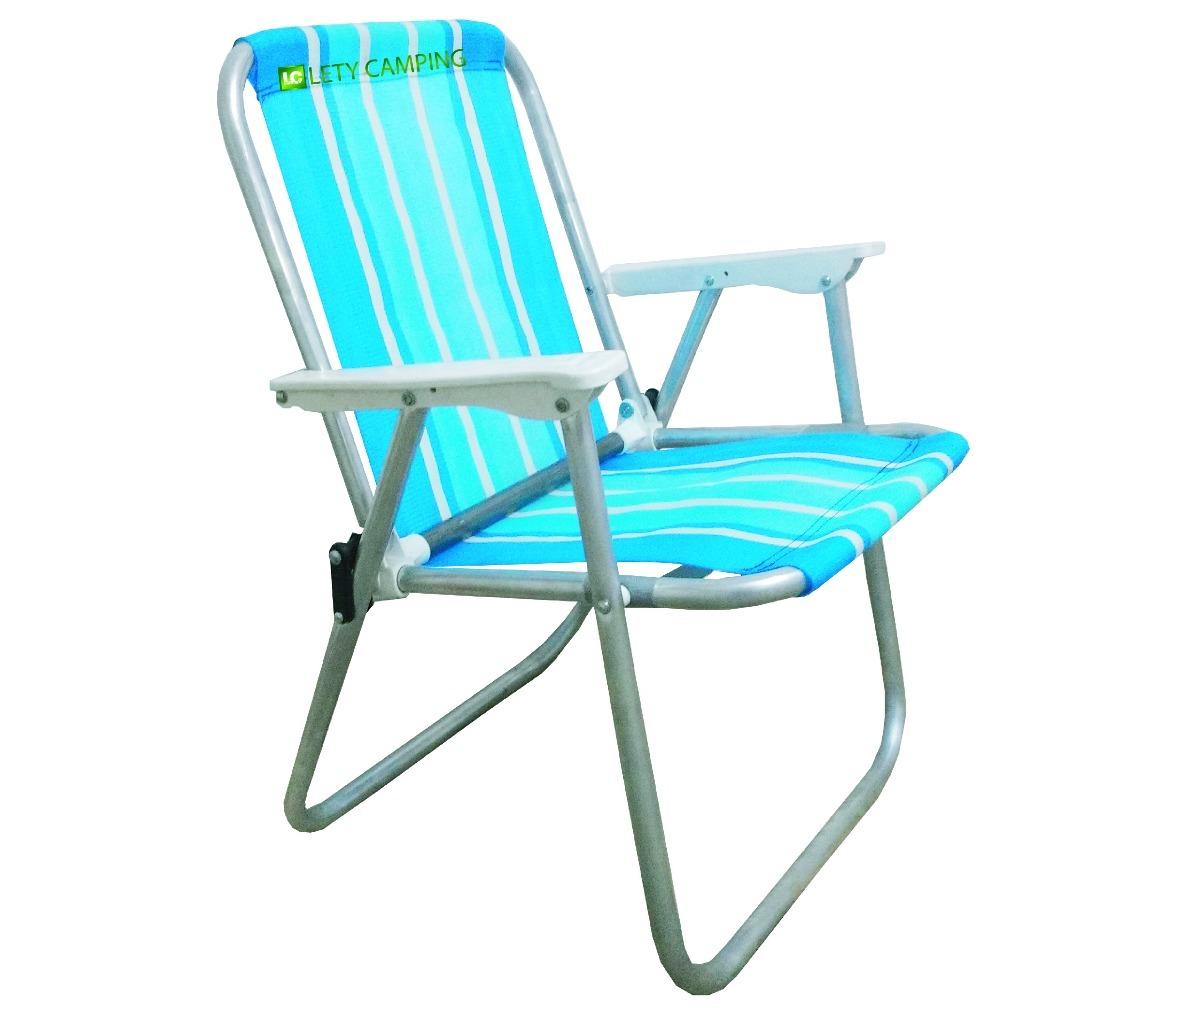 Sillas playa aluminio stunning silla playa aluminio alf with sillas playa aluminio sillas - Sillas crespo hipercor ...